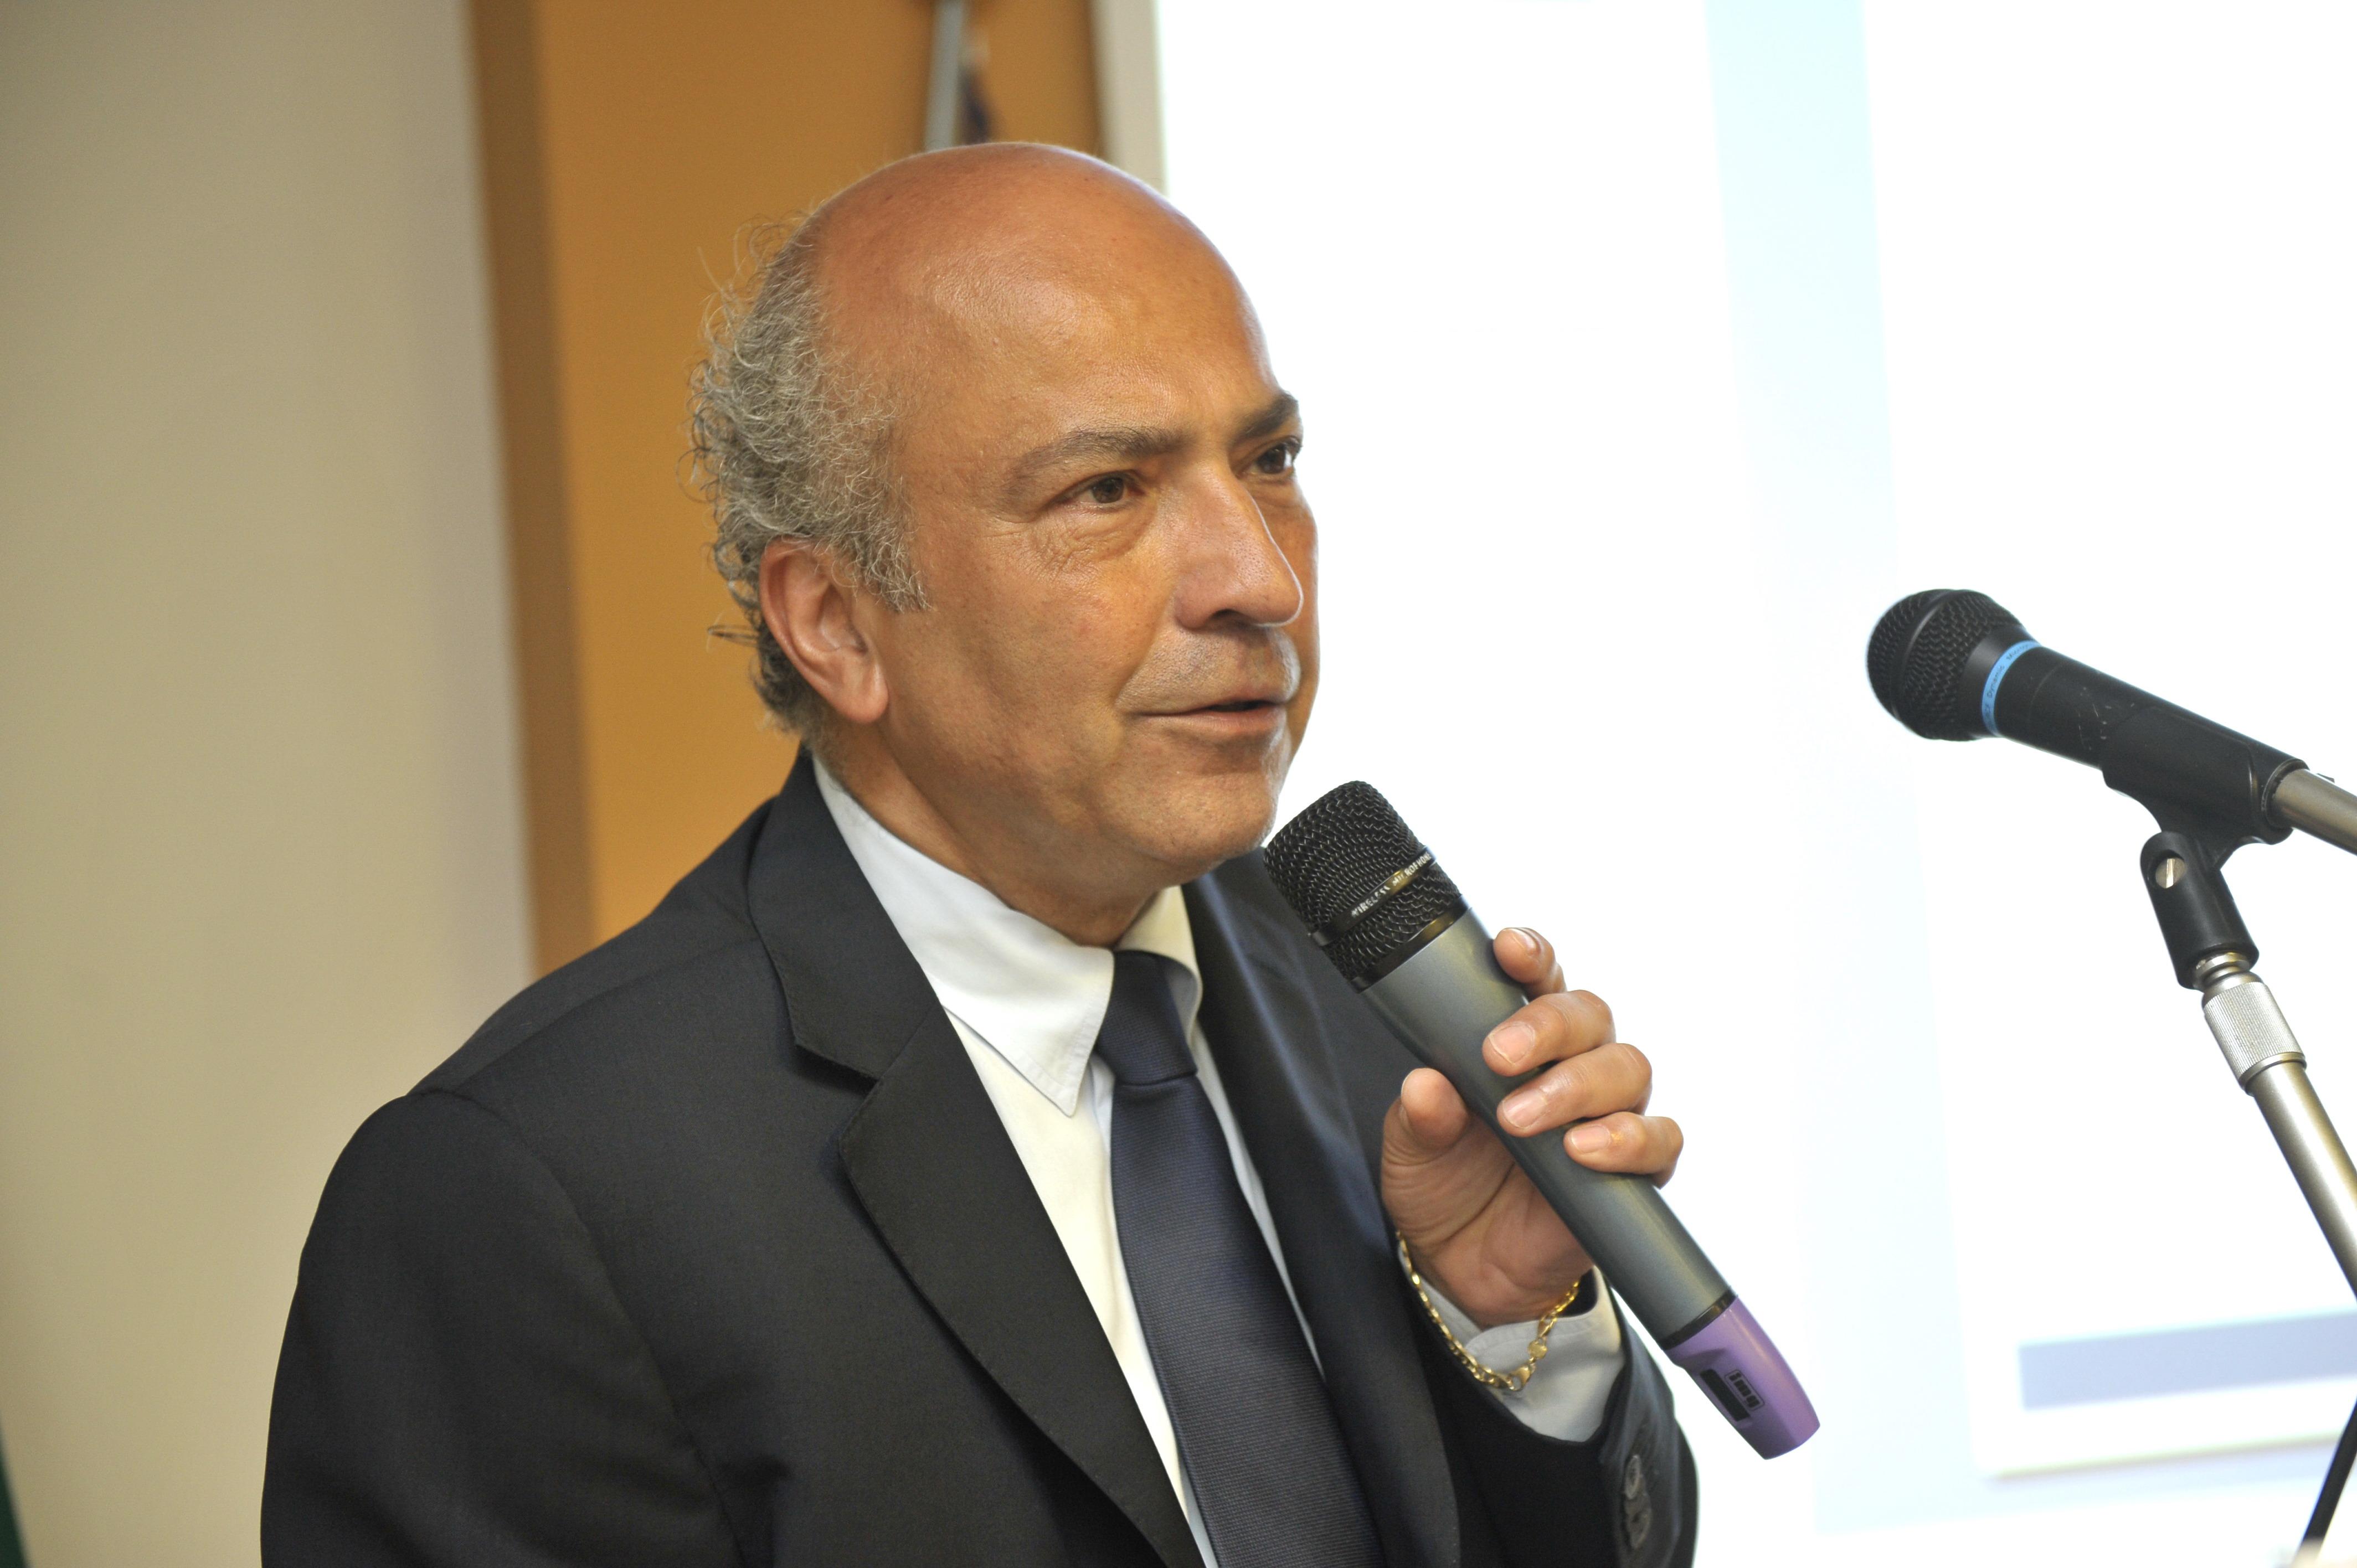 6.6.2015 - Interviene Alfio Amato, Segretario Nazionale SIAPAV, Angiologo